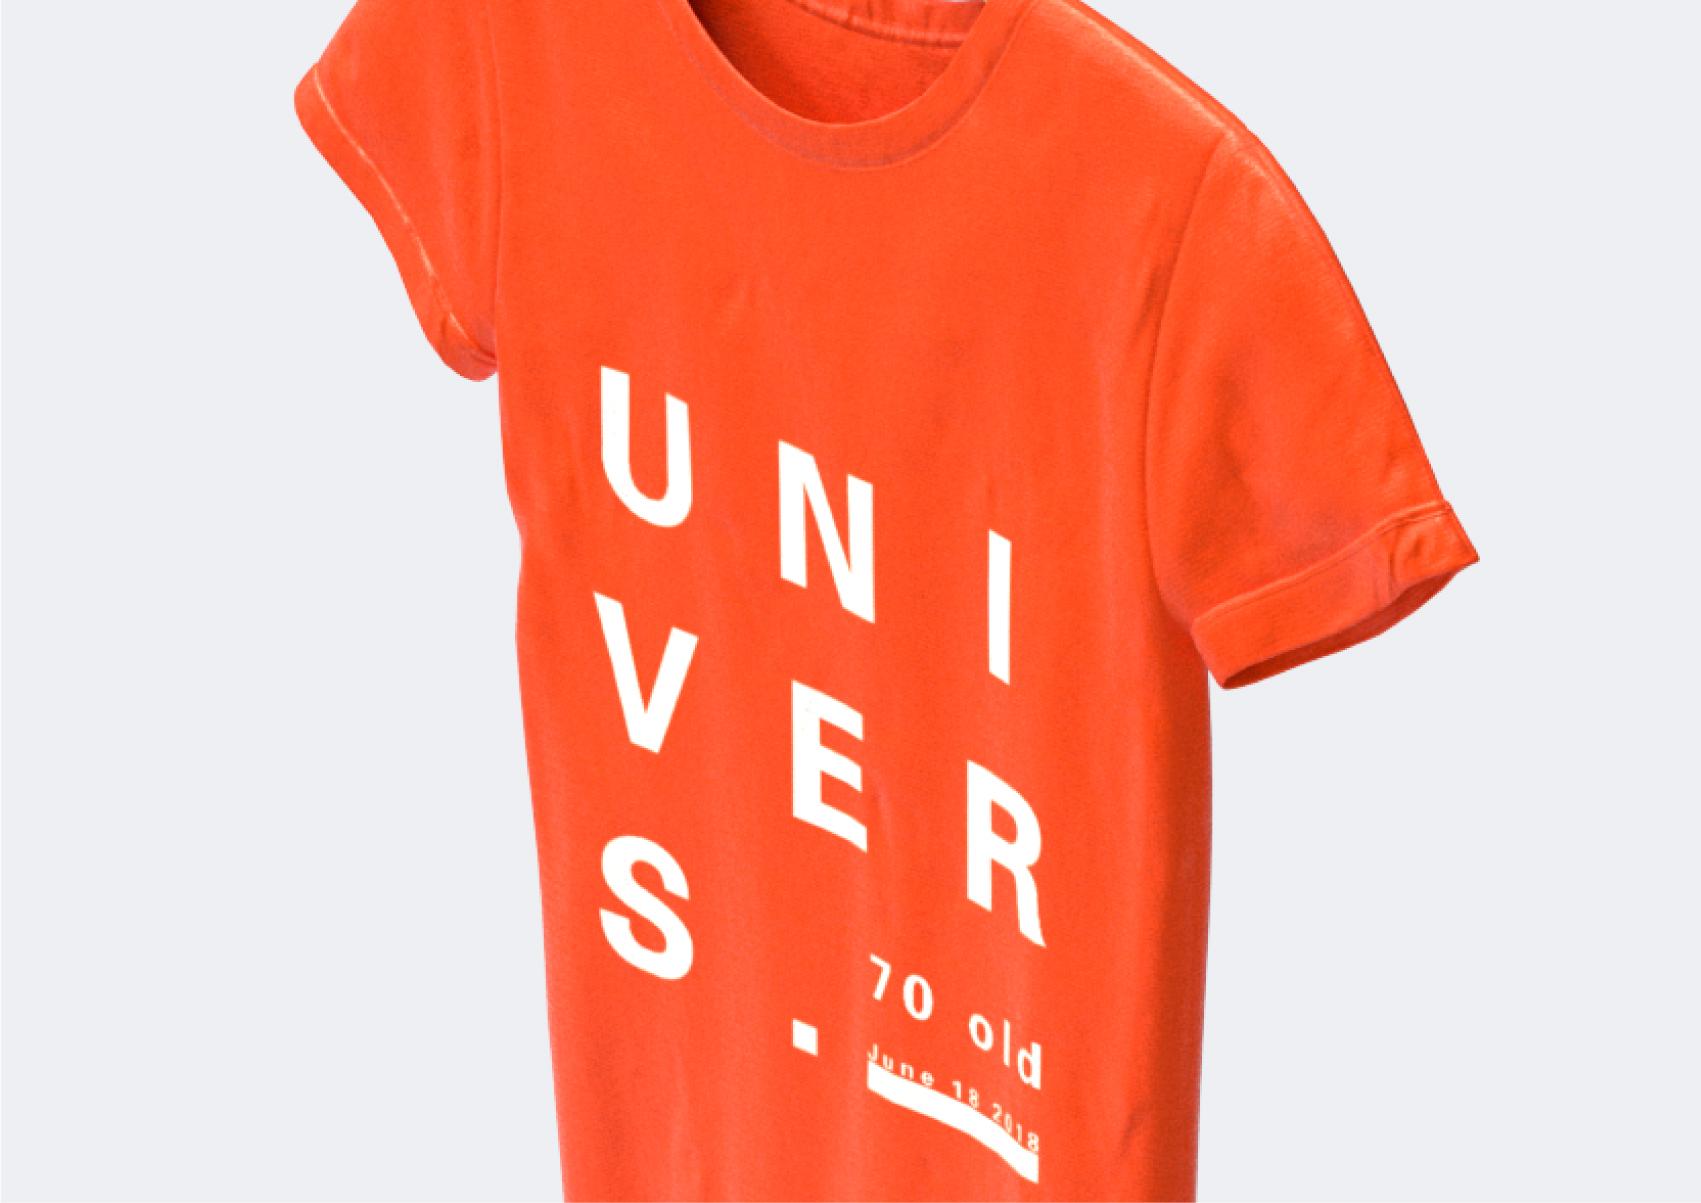 Univers-T-shirt